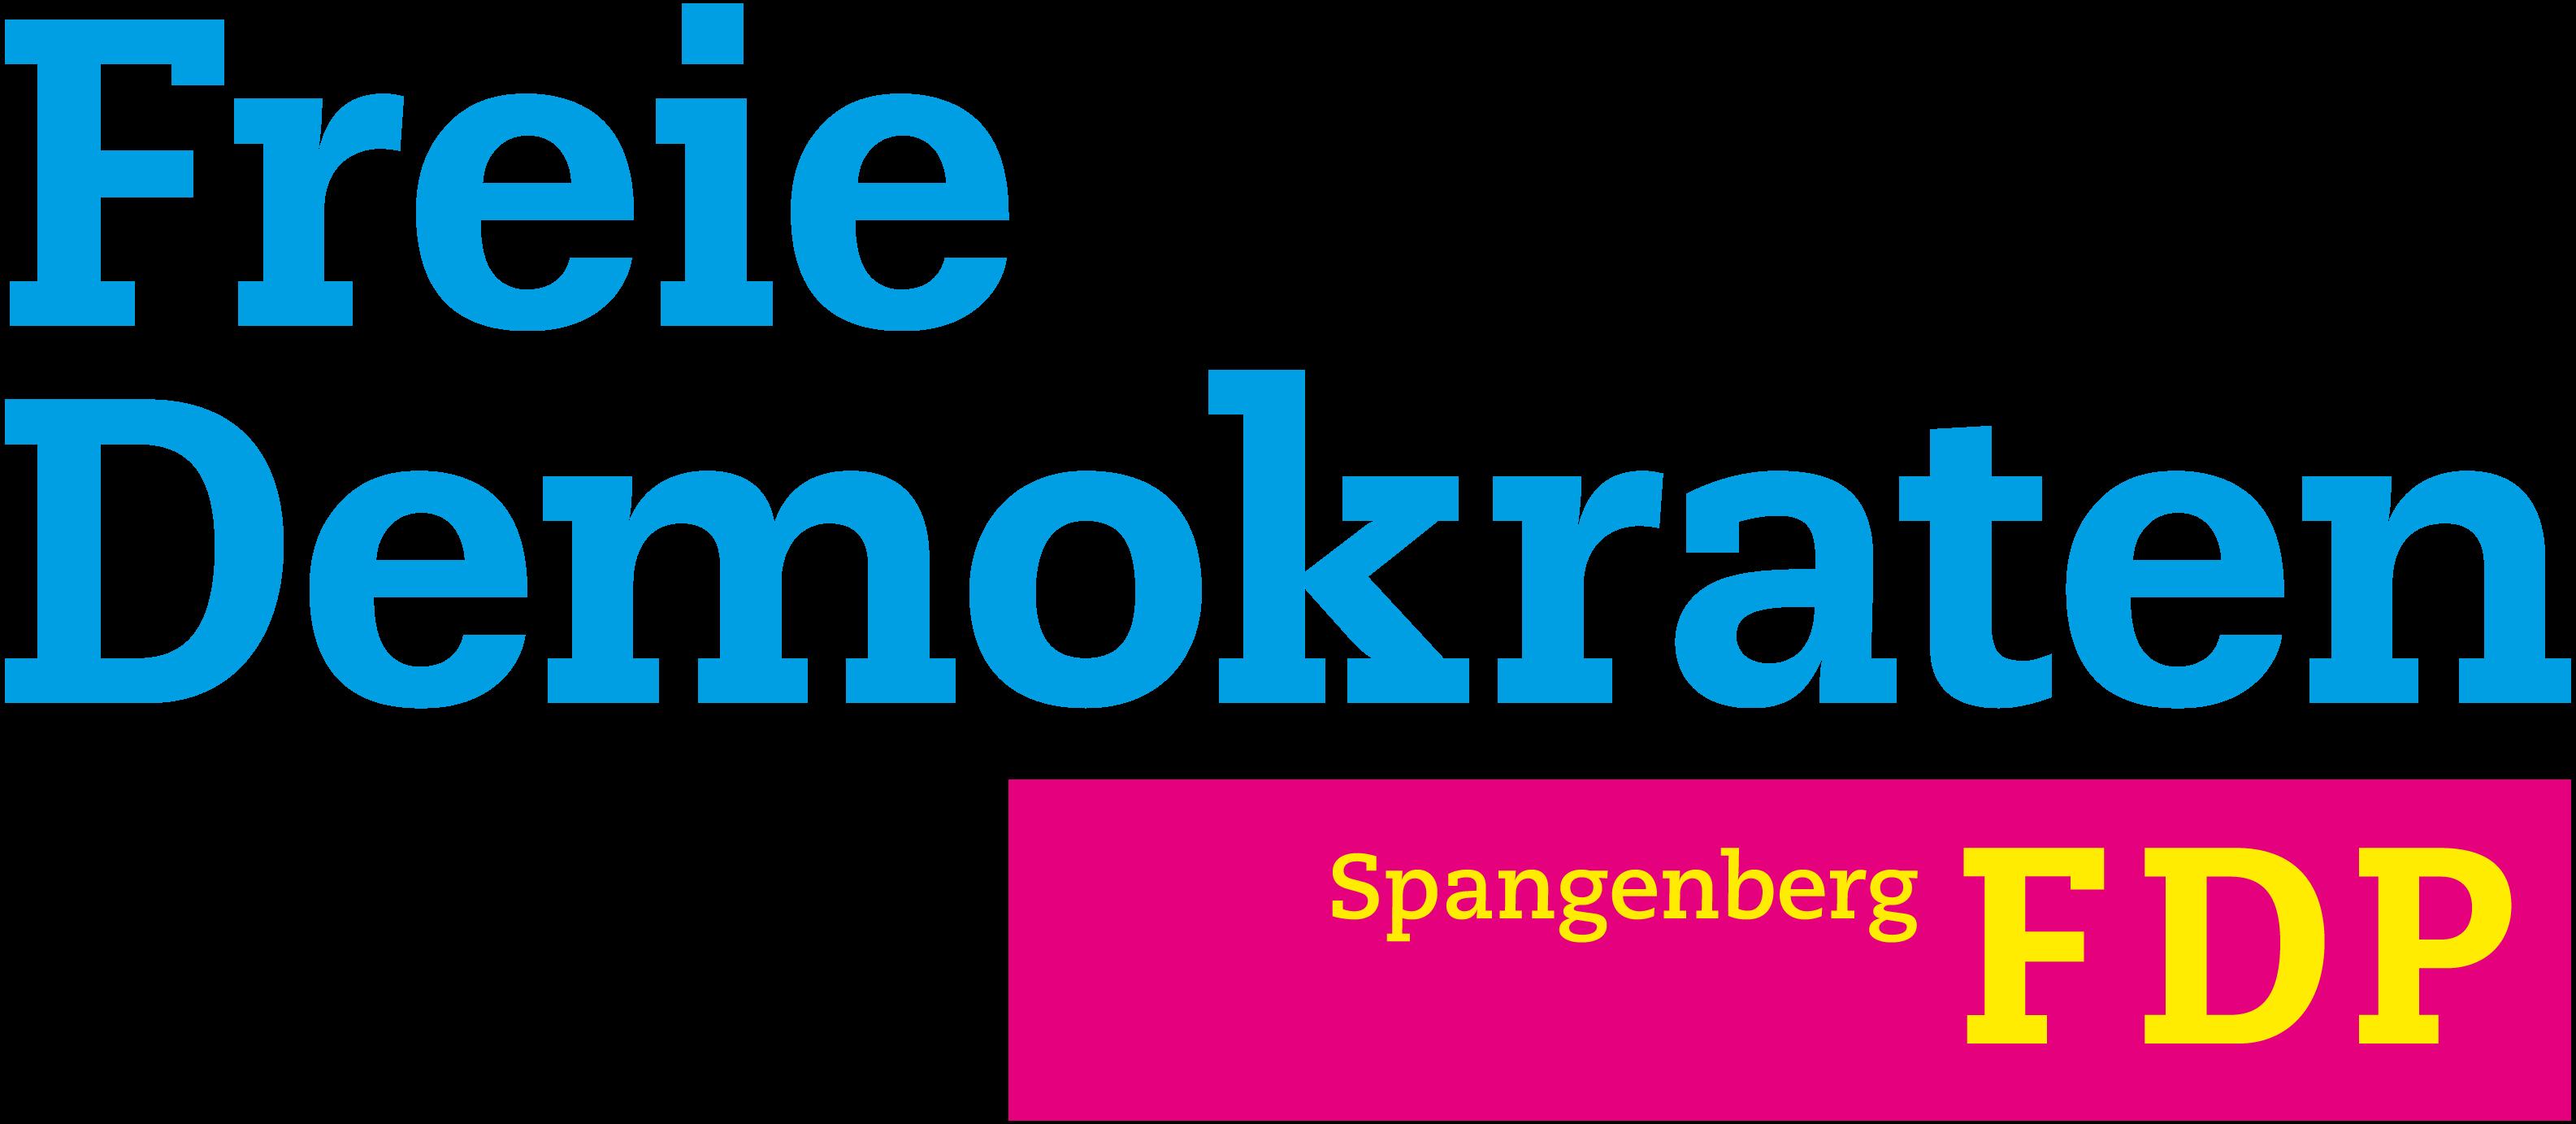 FDP Spangenberg